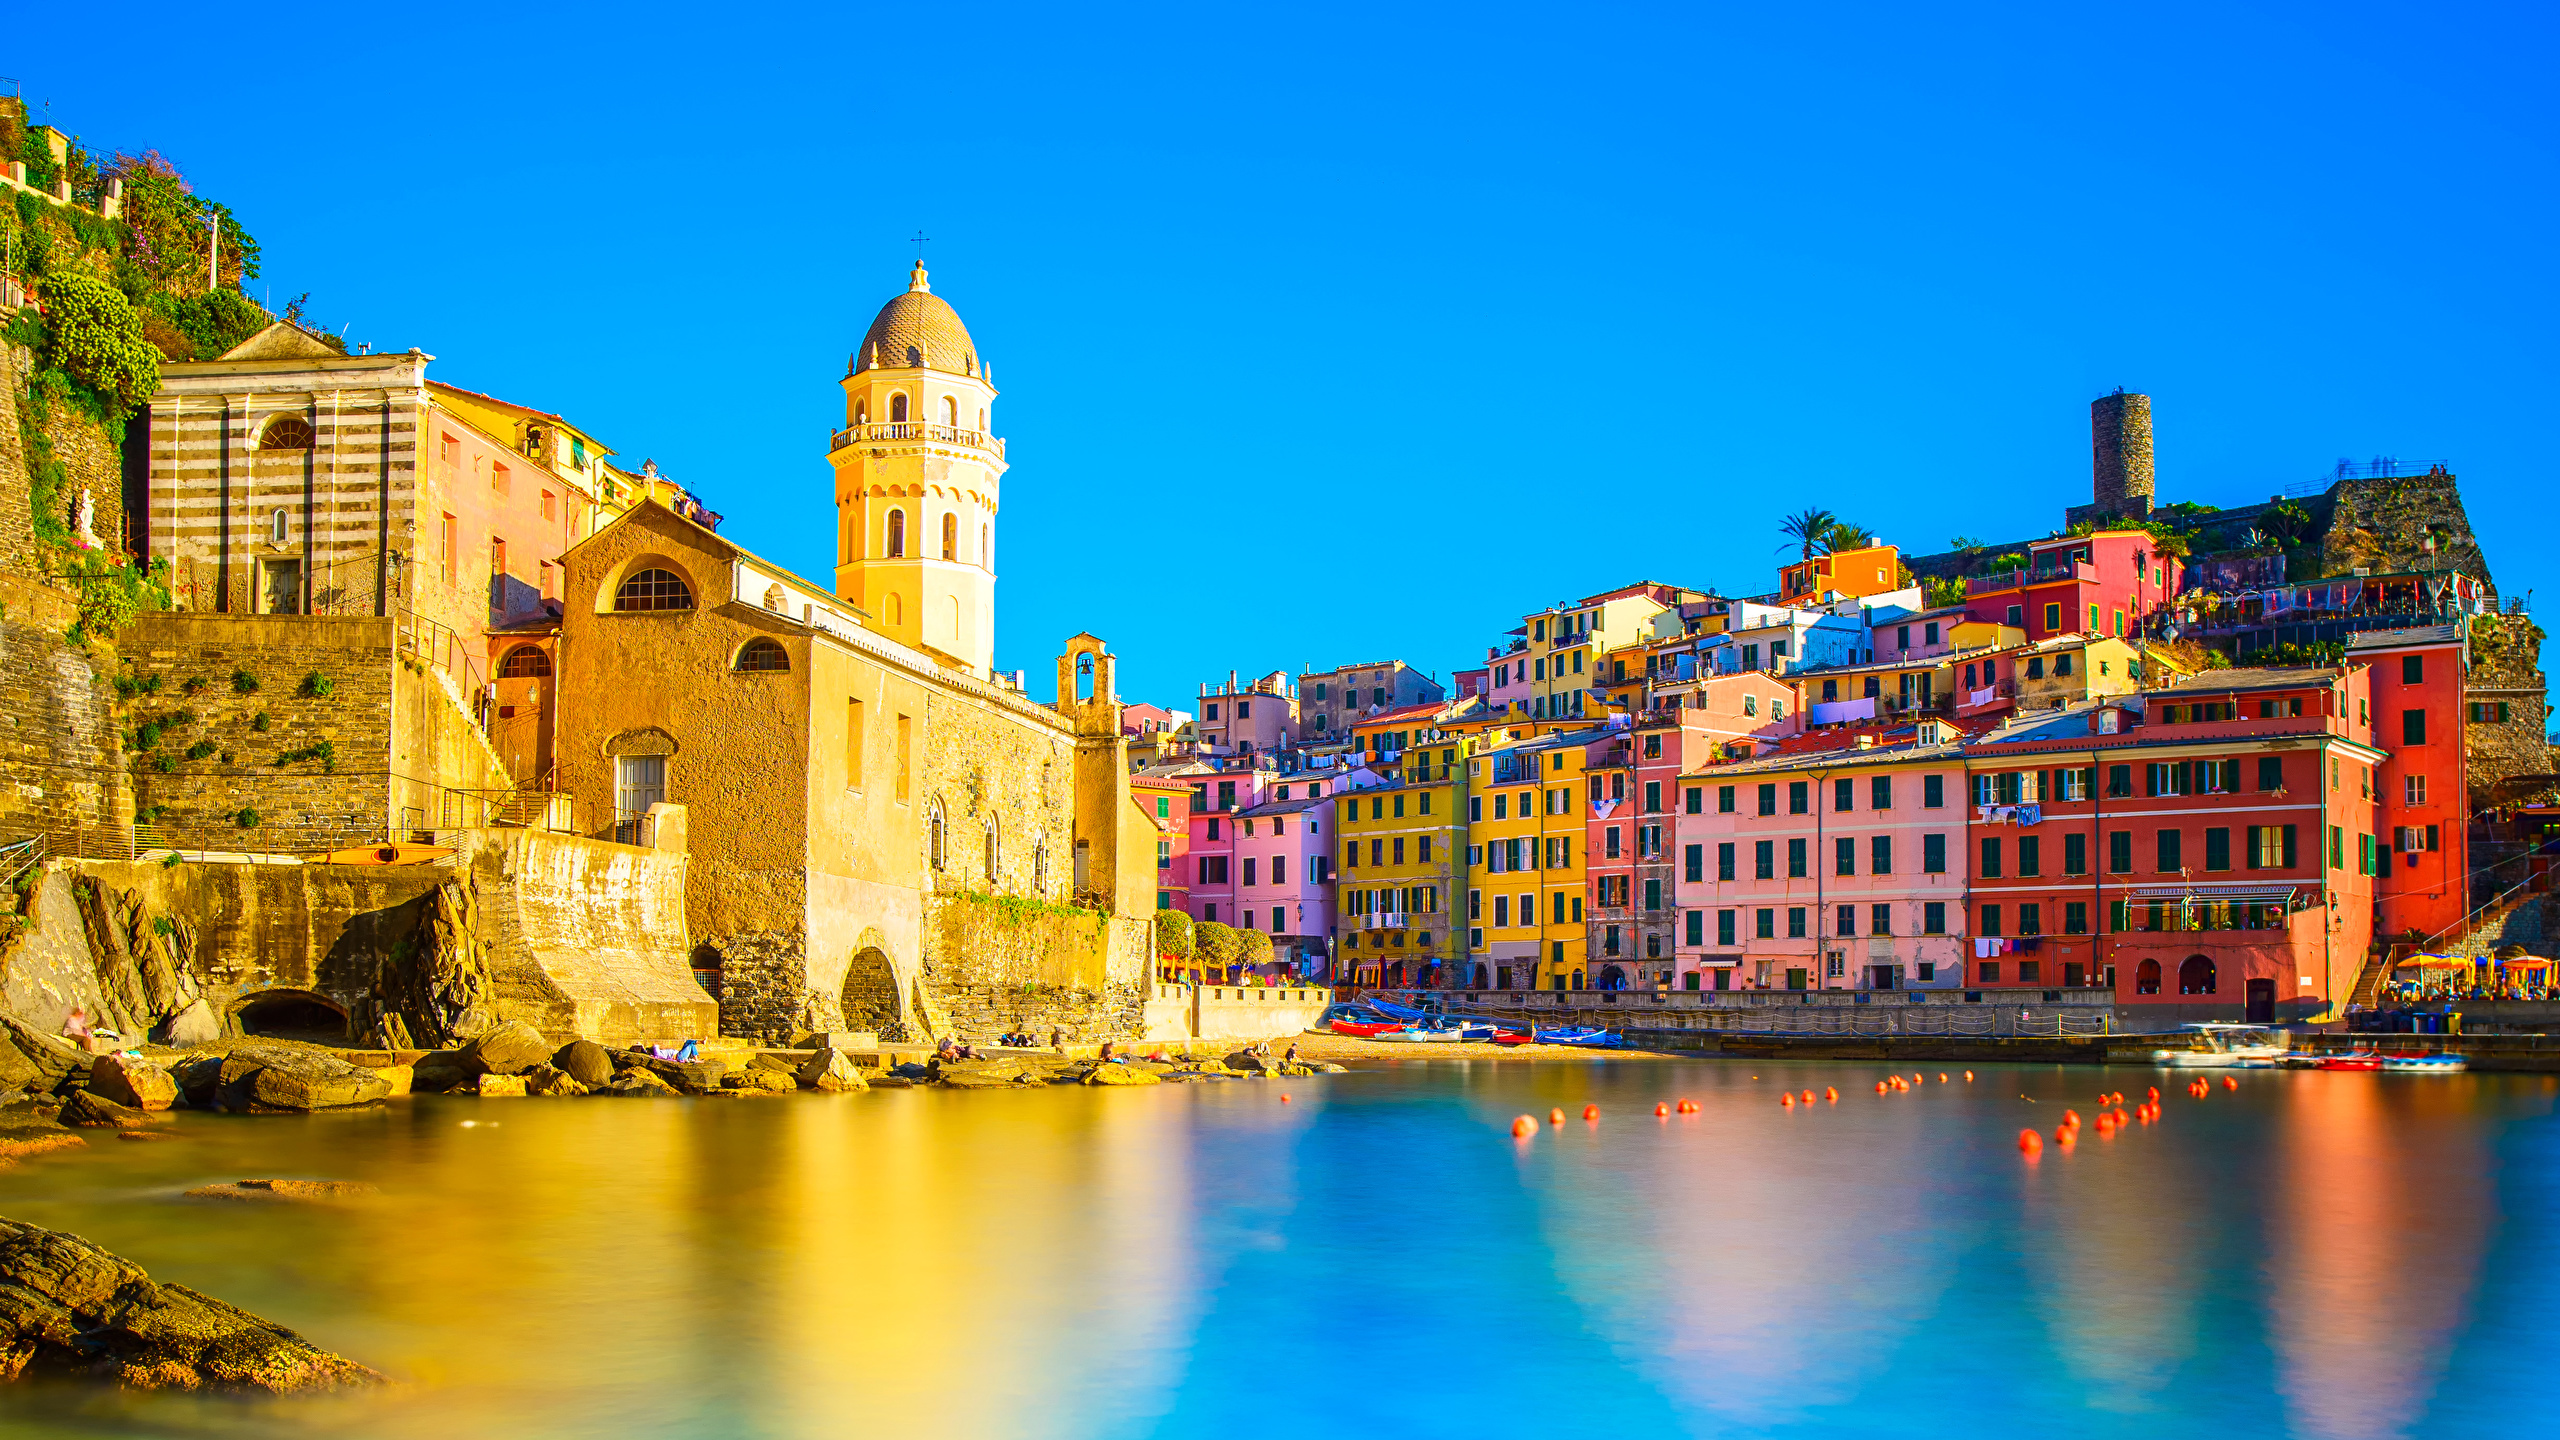 Images Liguria Vernazza Cinque Terre park Italy Sea Cities 2560x1440 2560x1440